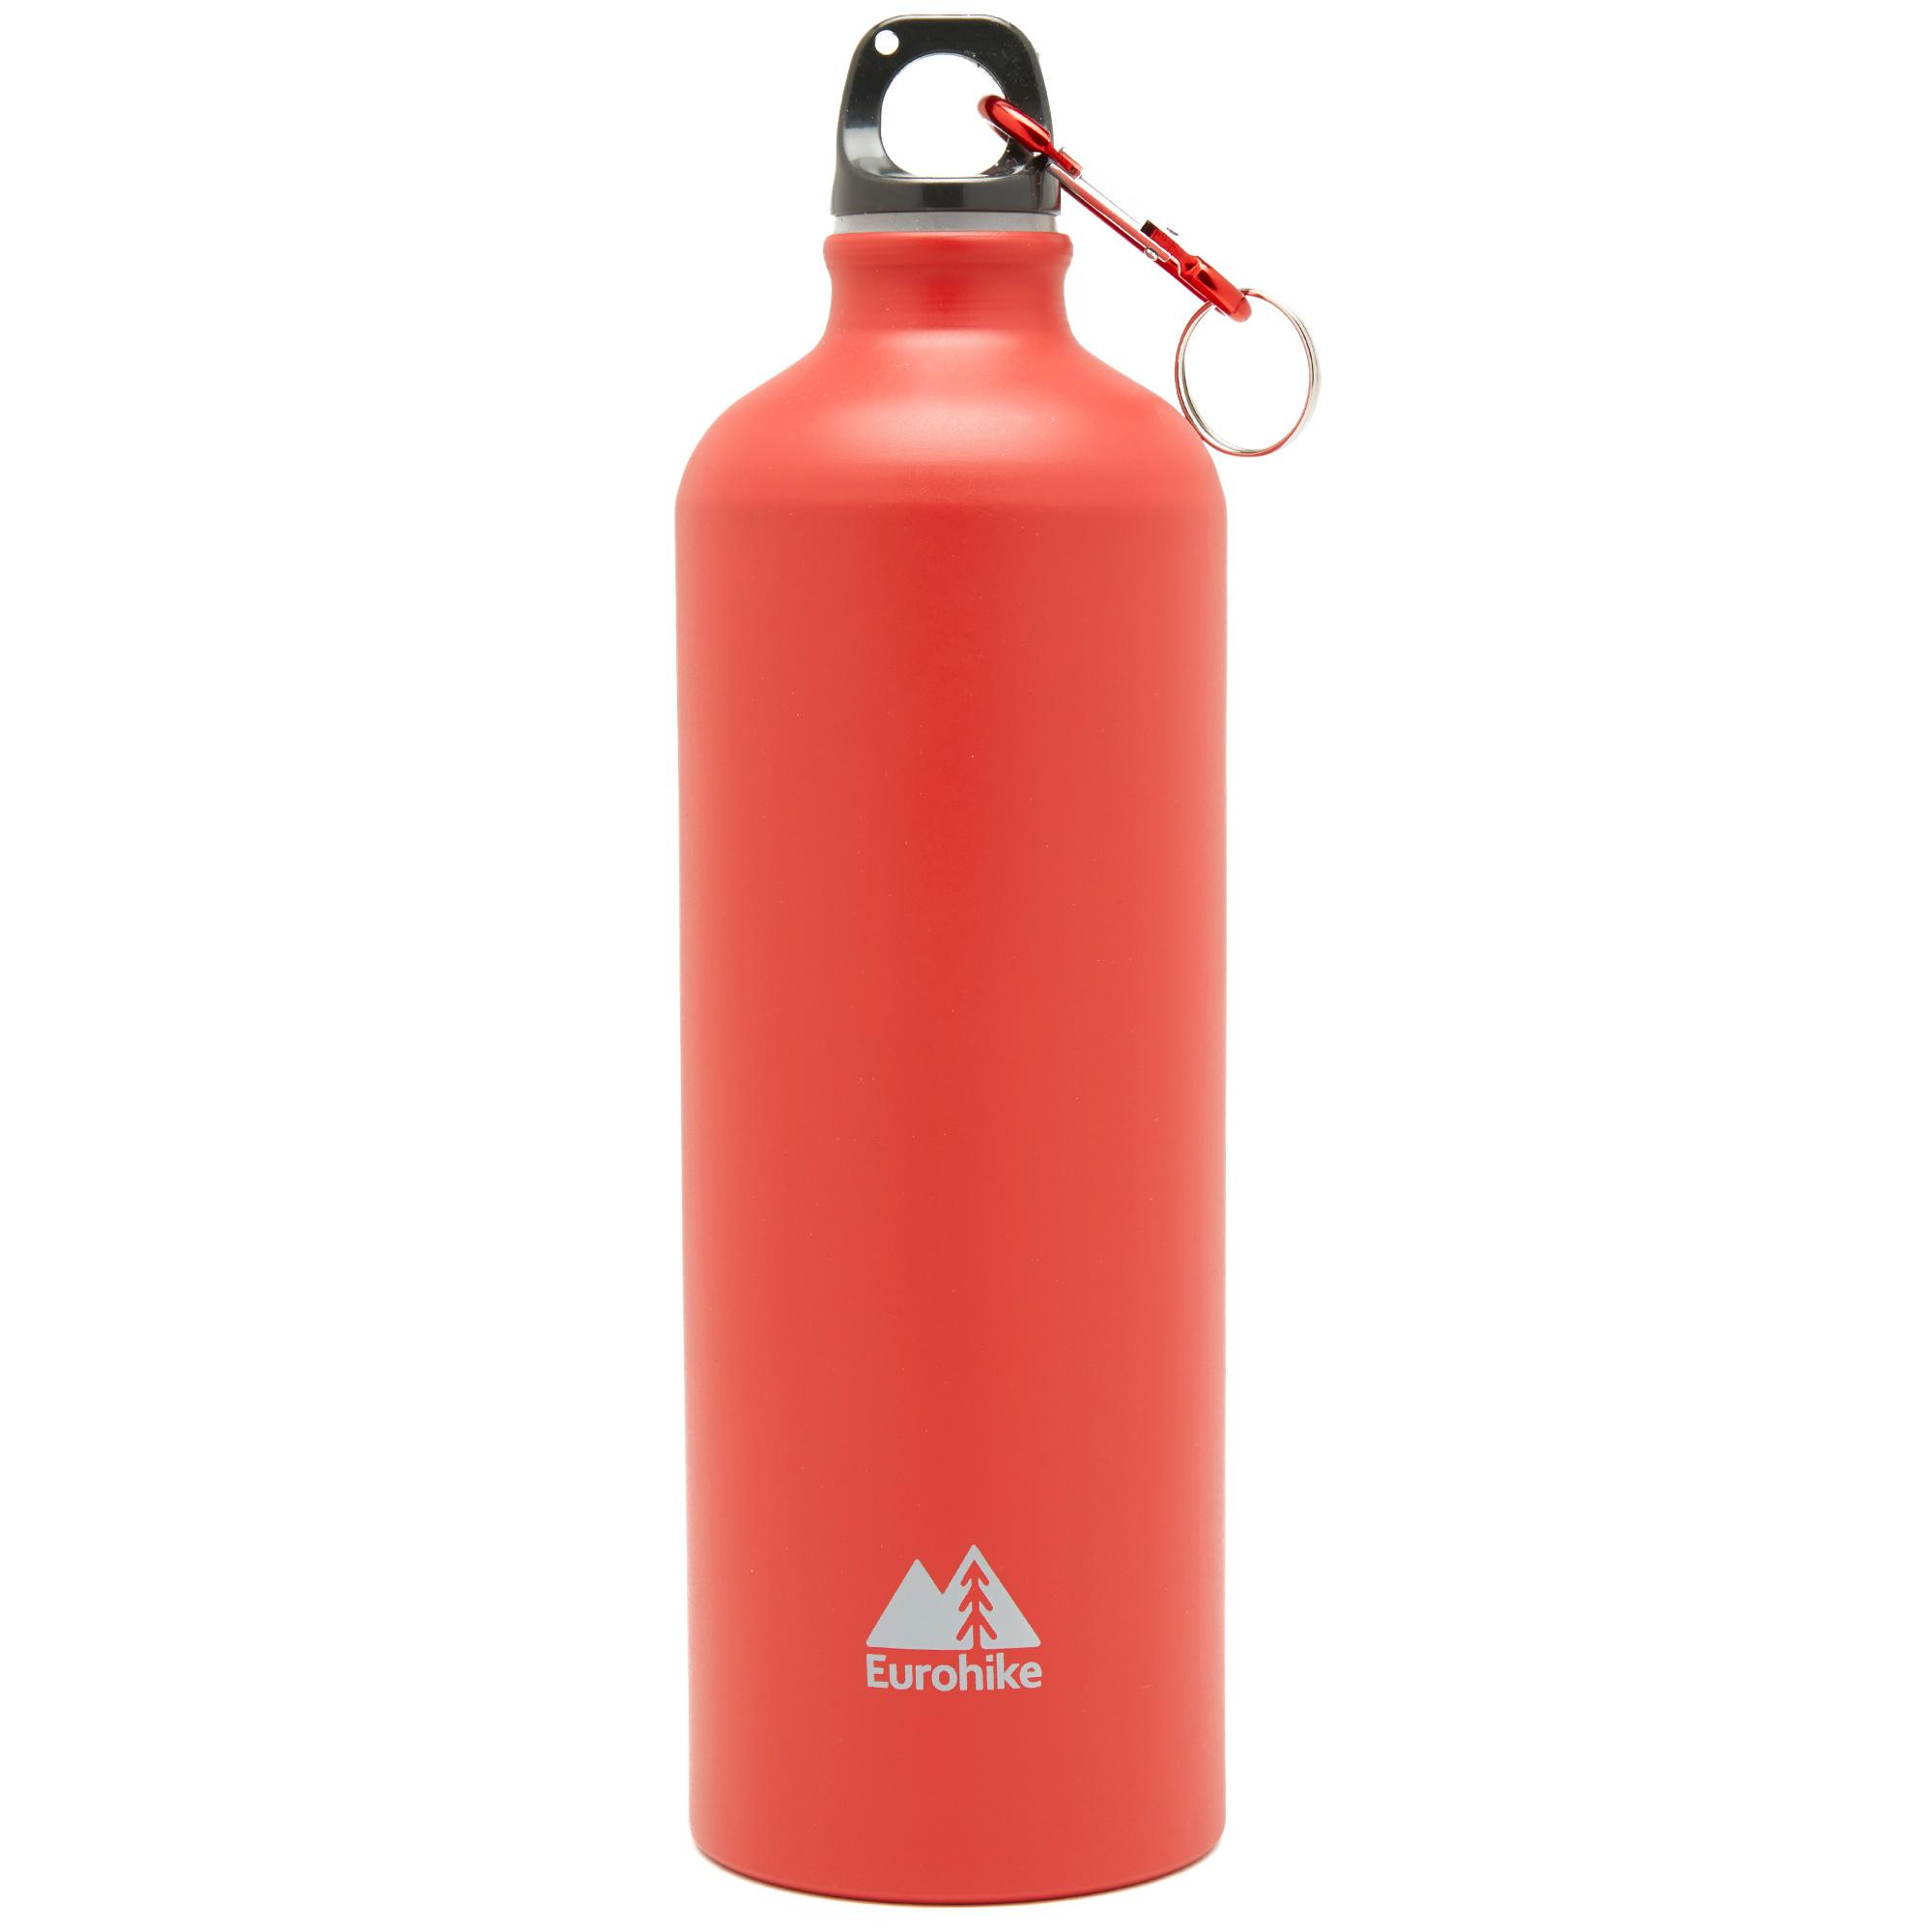 Eurohike Aqua 1L Aluminium Bottle, RED/RED